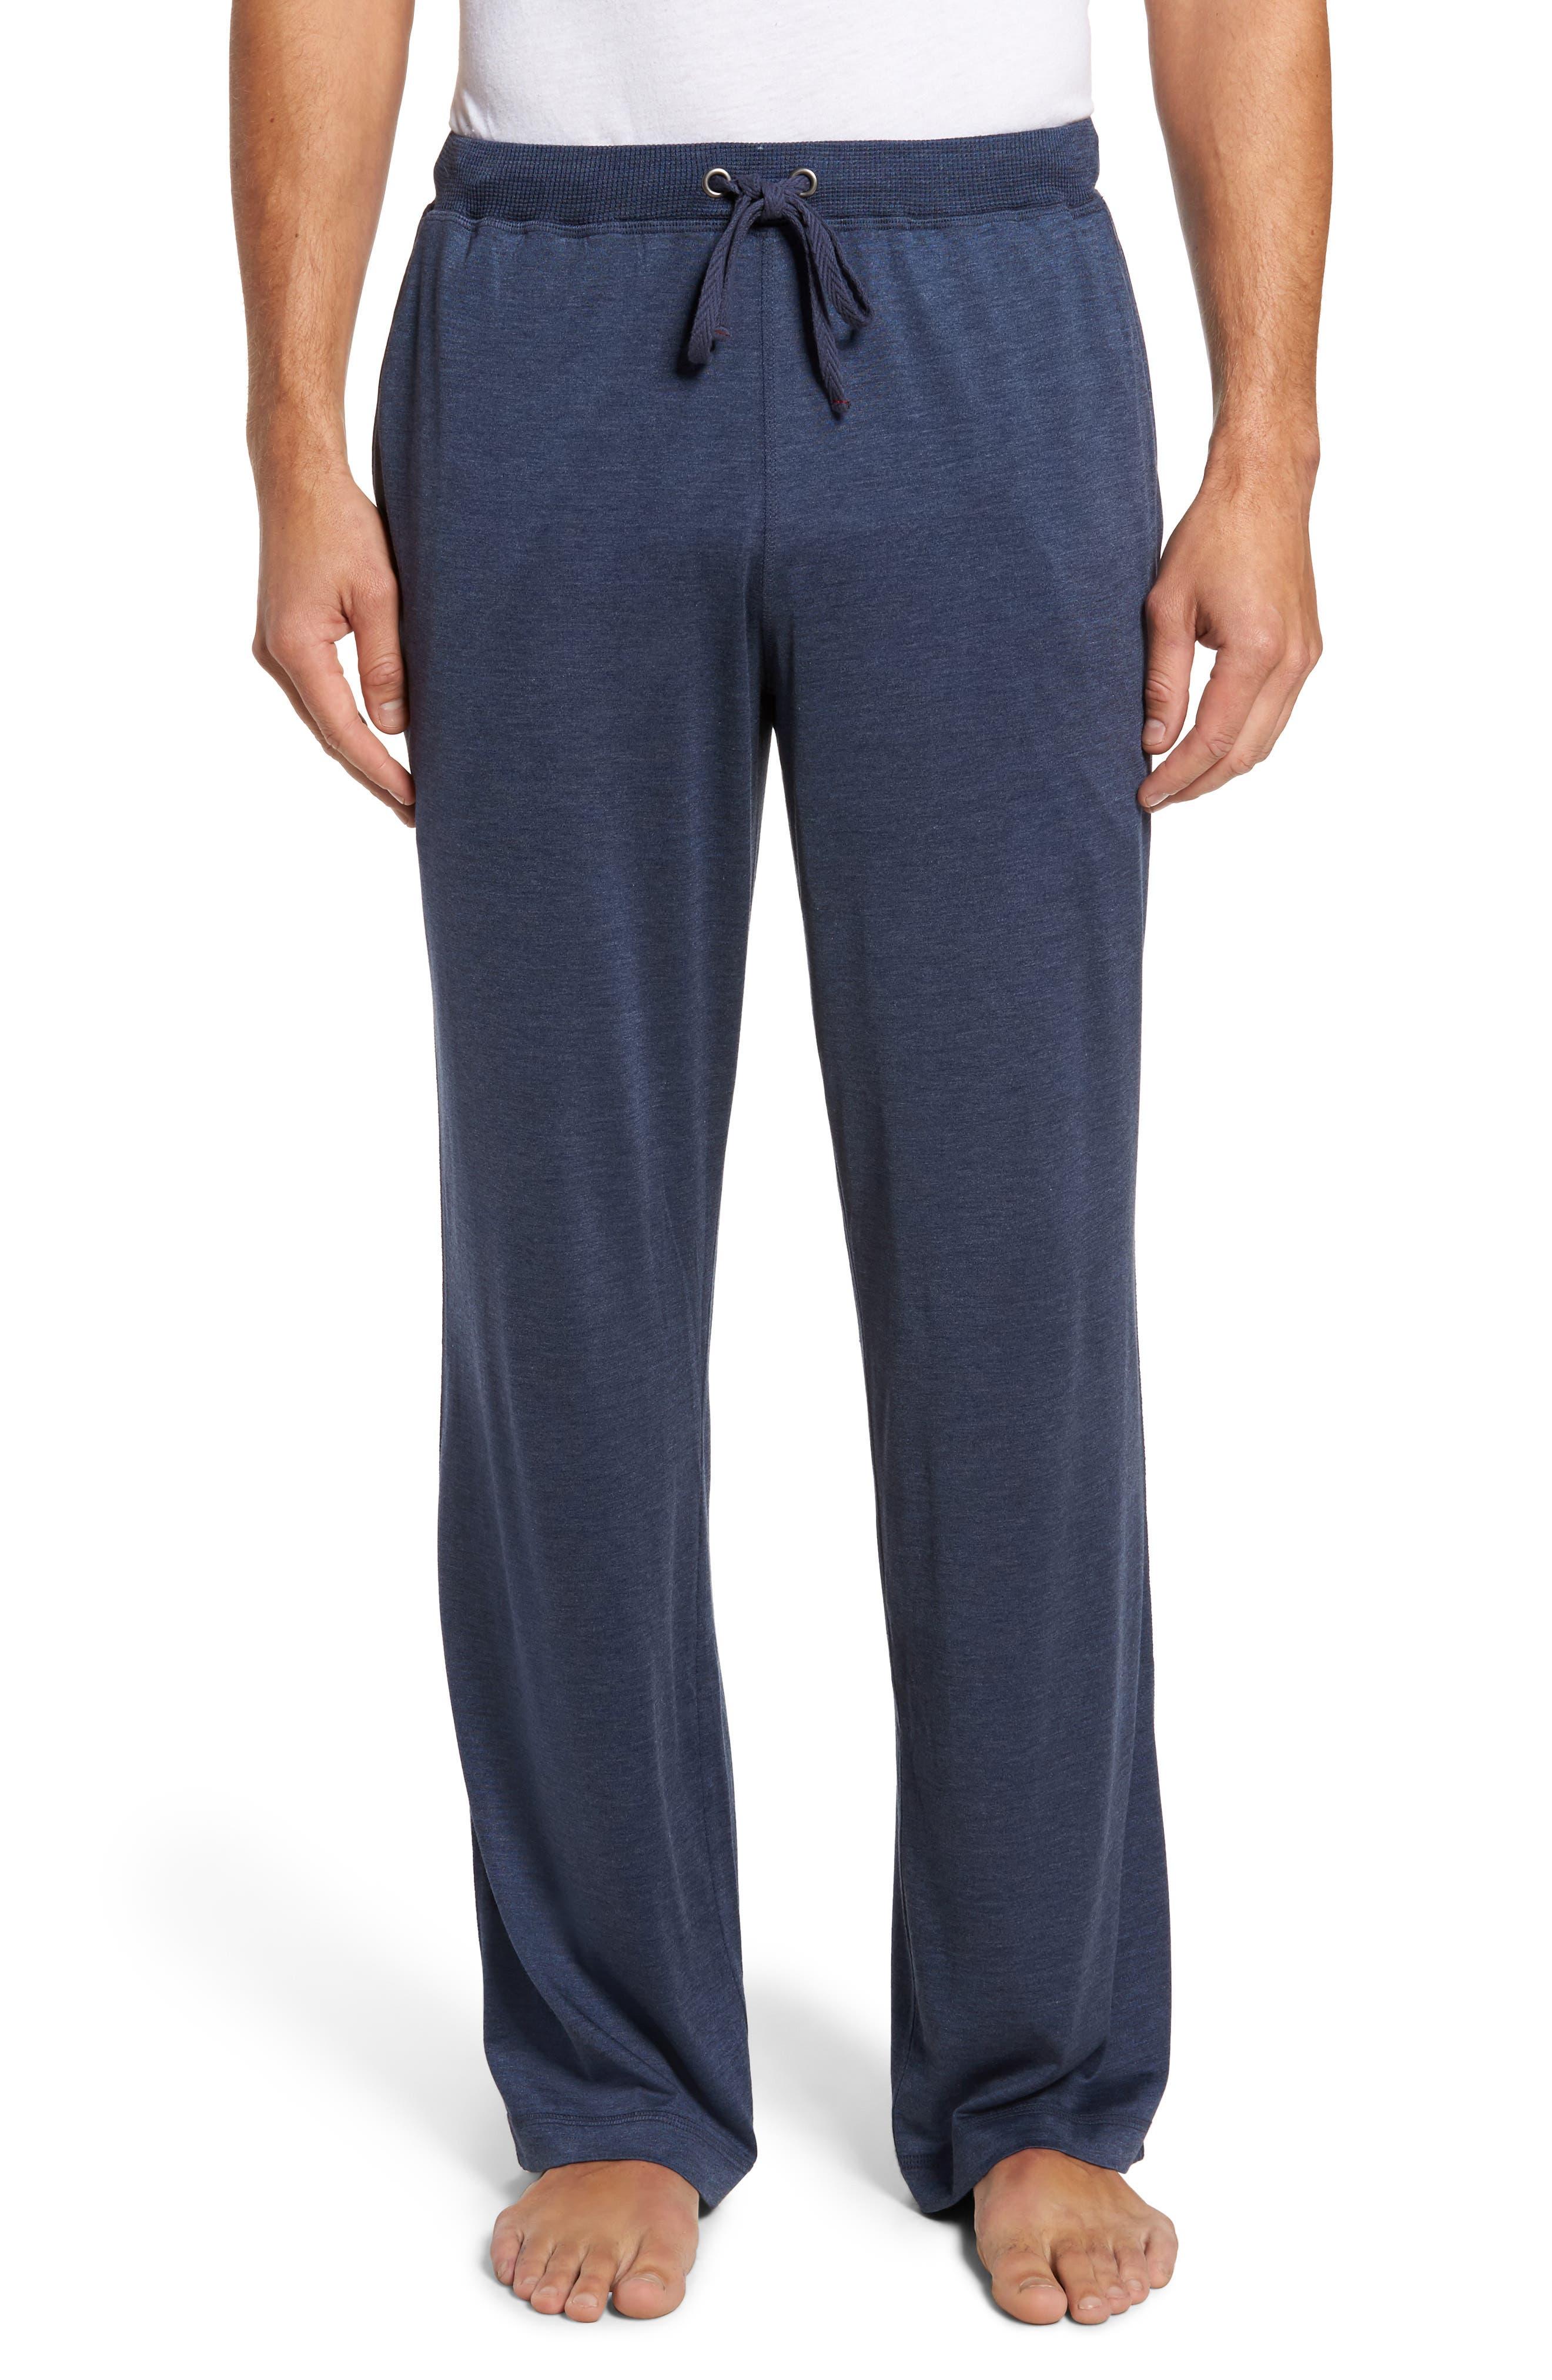 Alternate Image 1 Selected - Daniel Buchler Silk & Cotton Lounge Pants